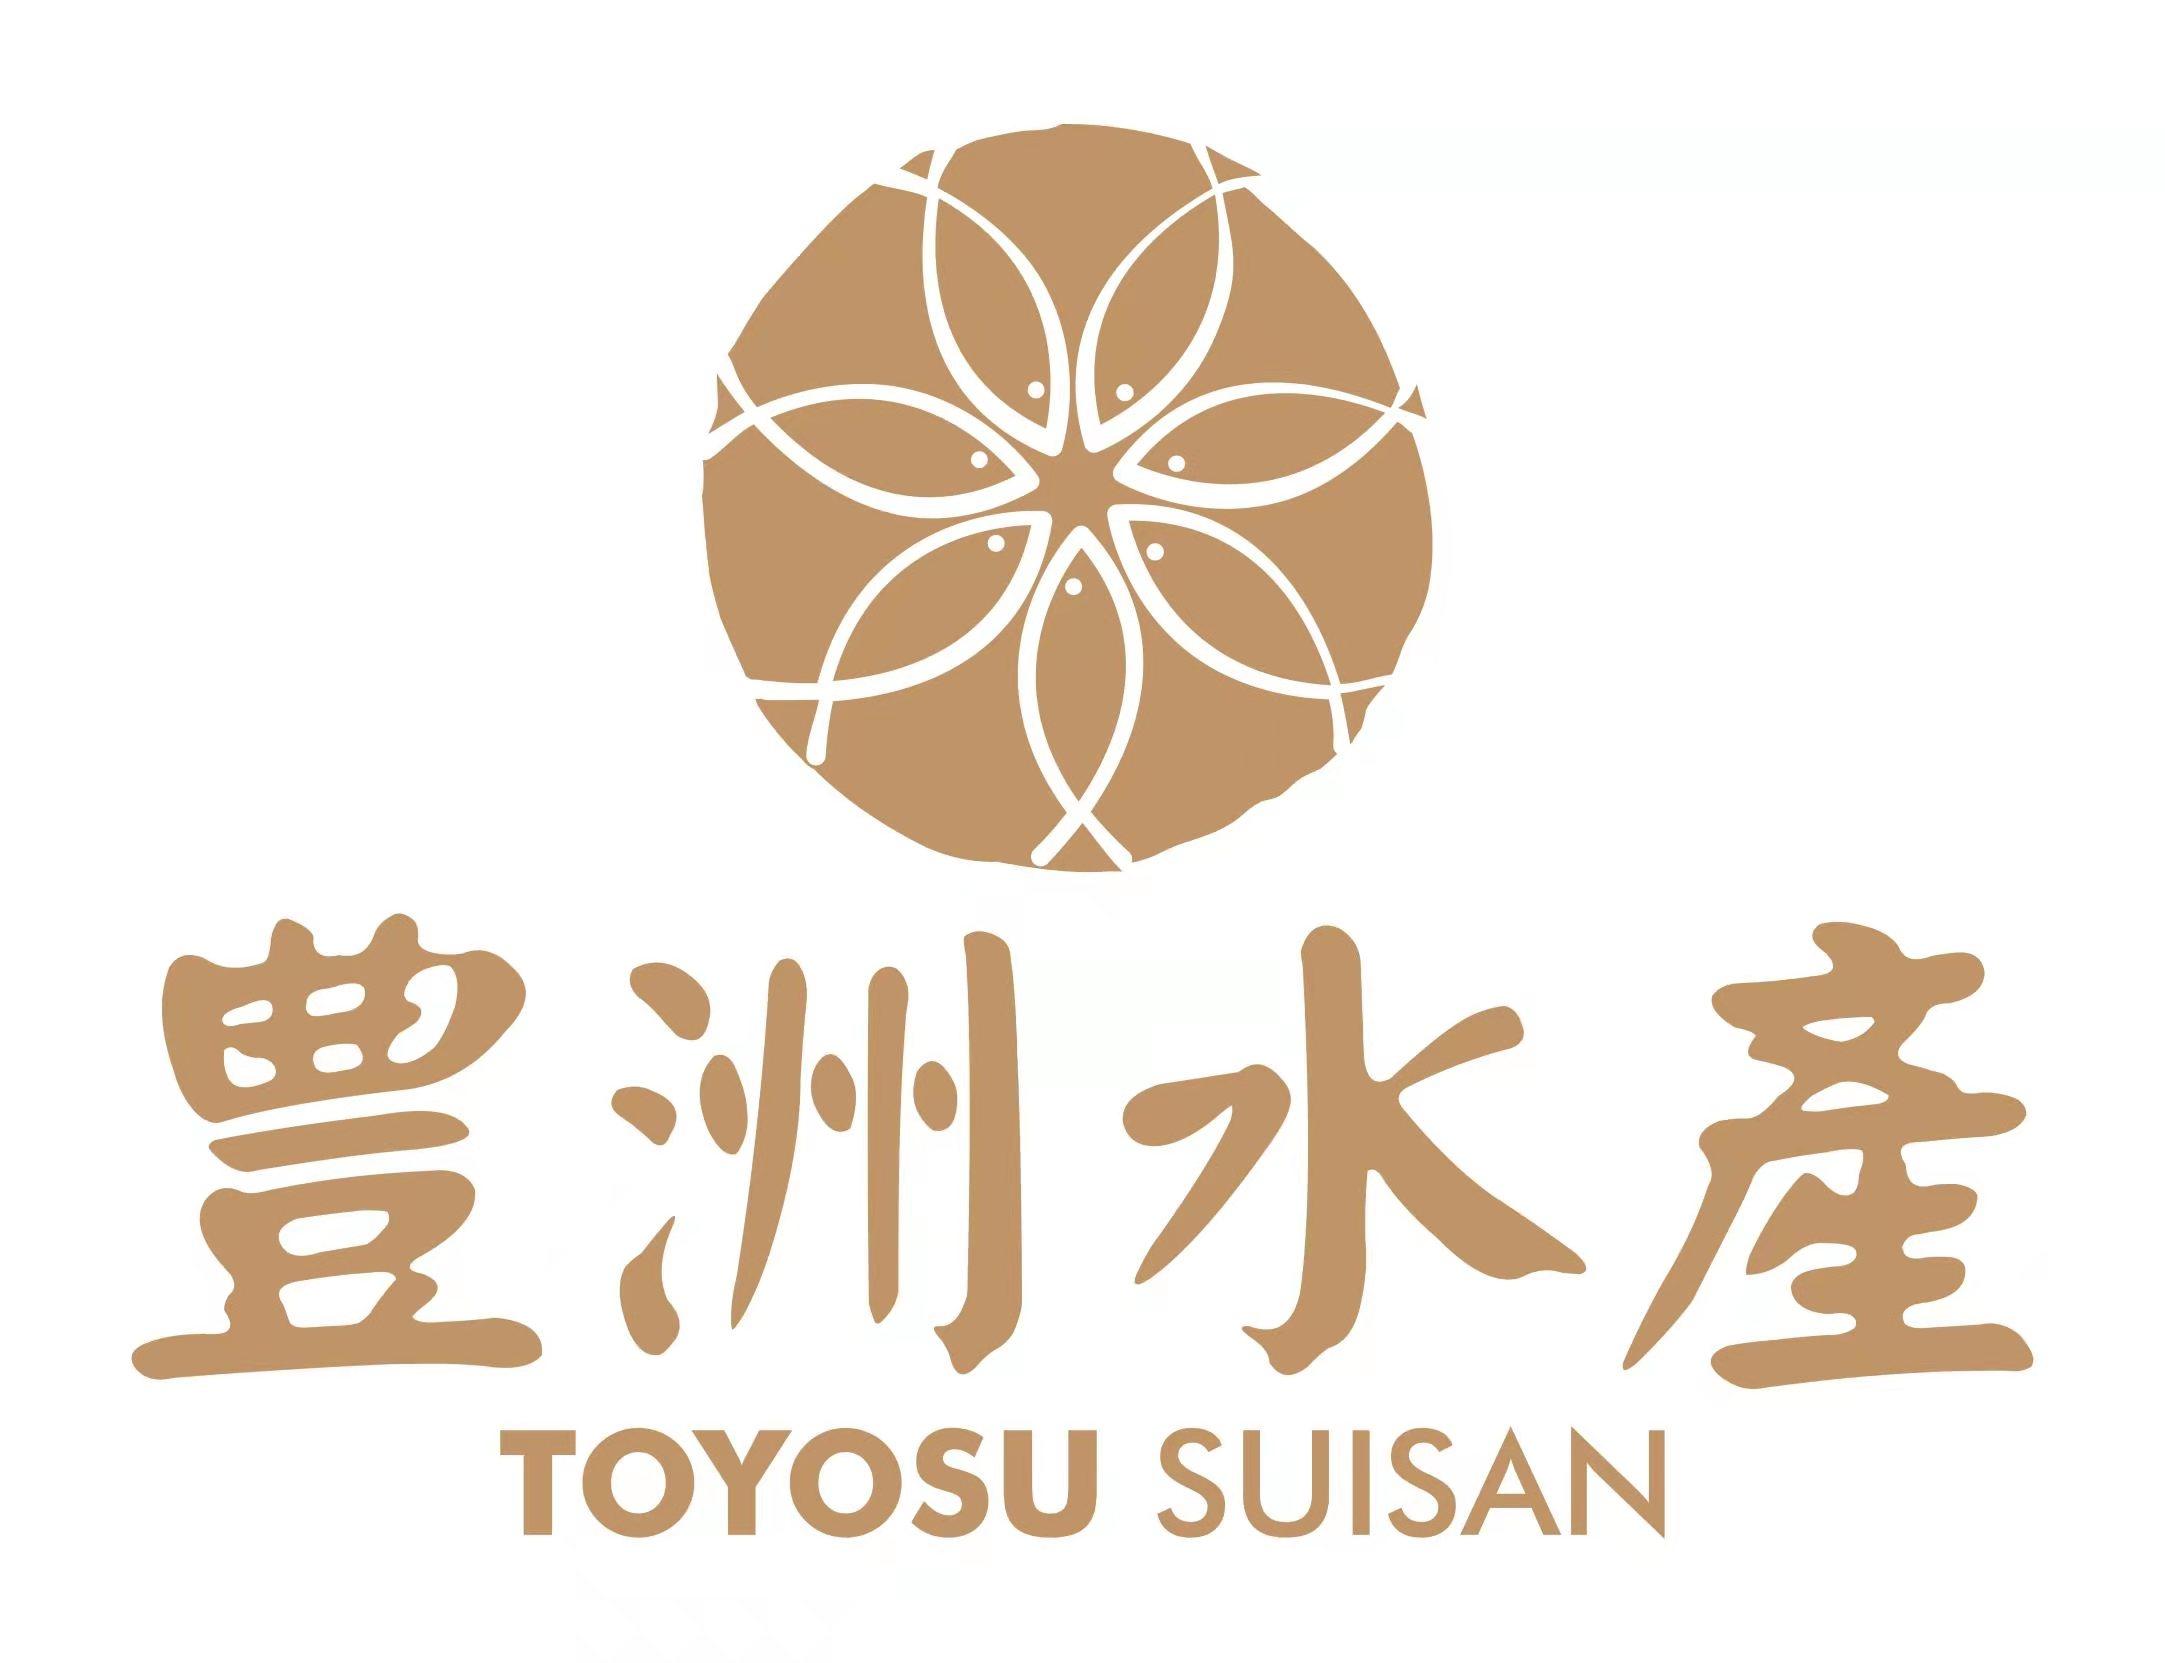 Toyosu Suisan (Coming Soon) logo